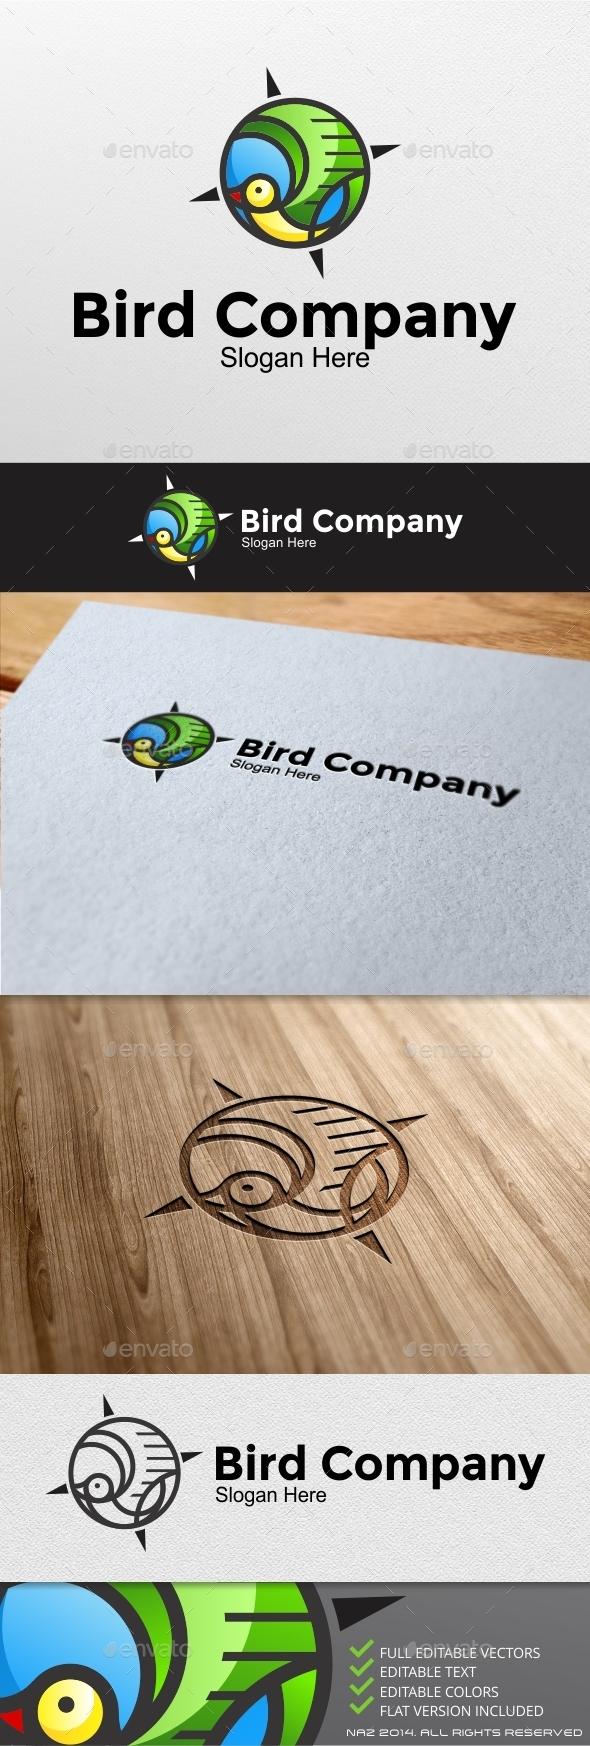 Bird Compass Logo - Animals Logo Templates